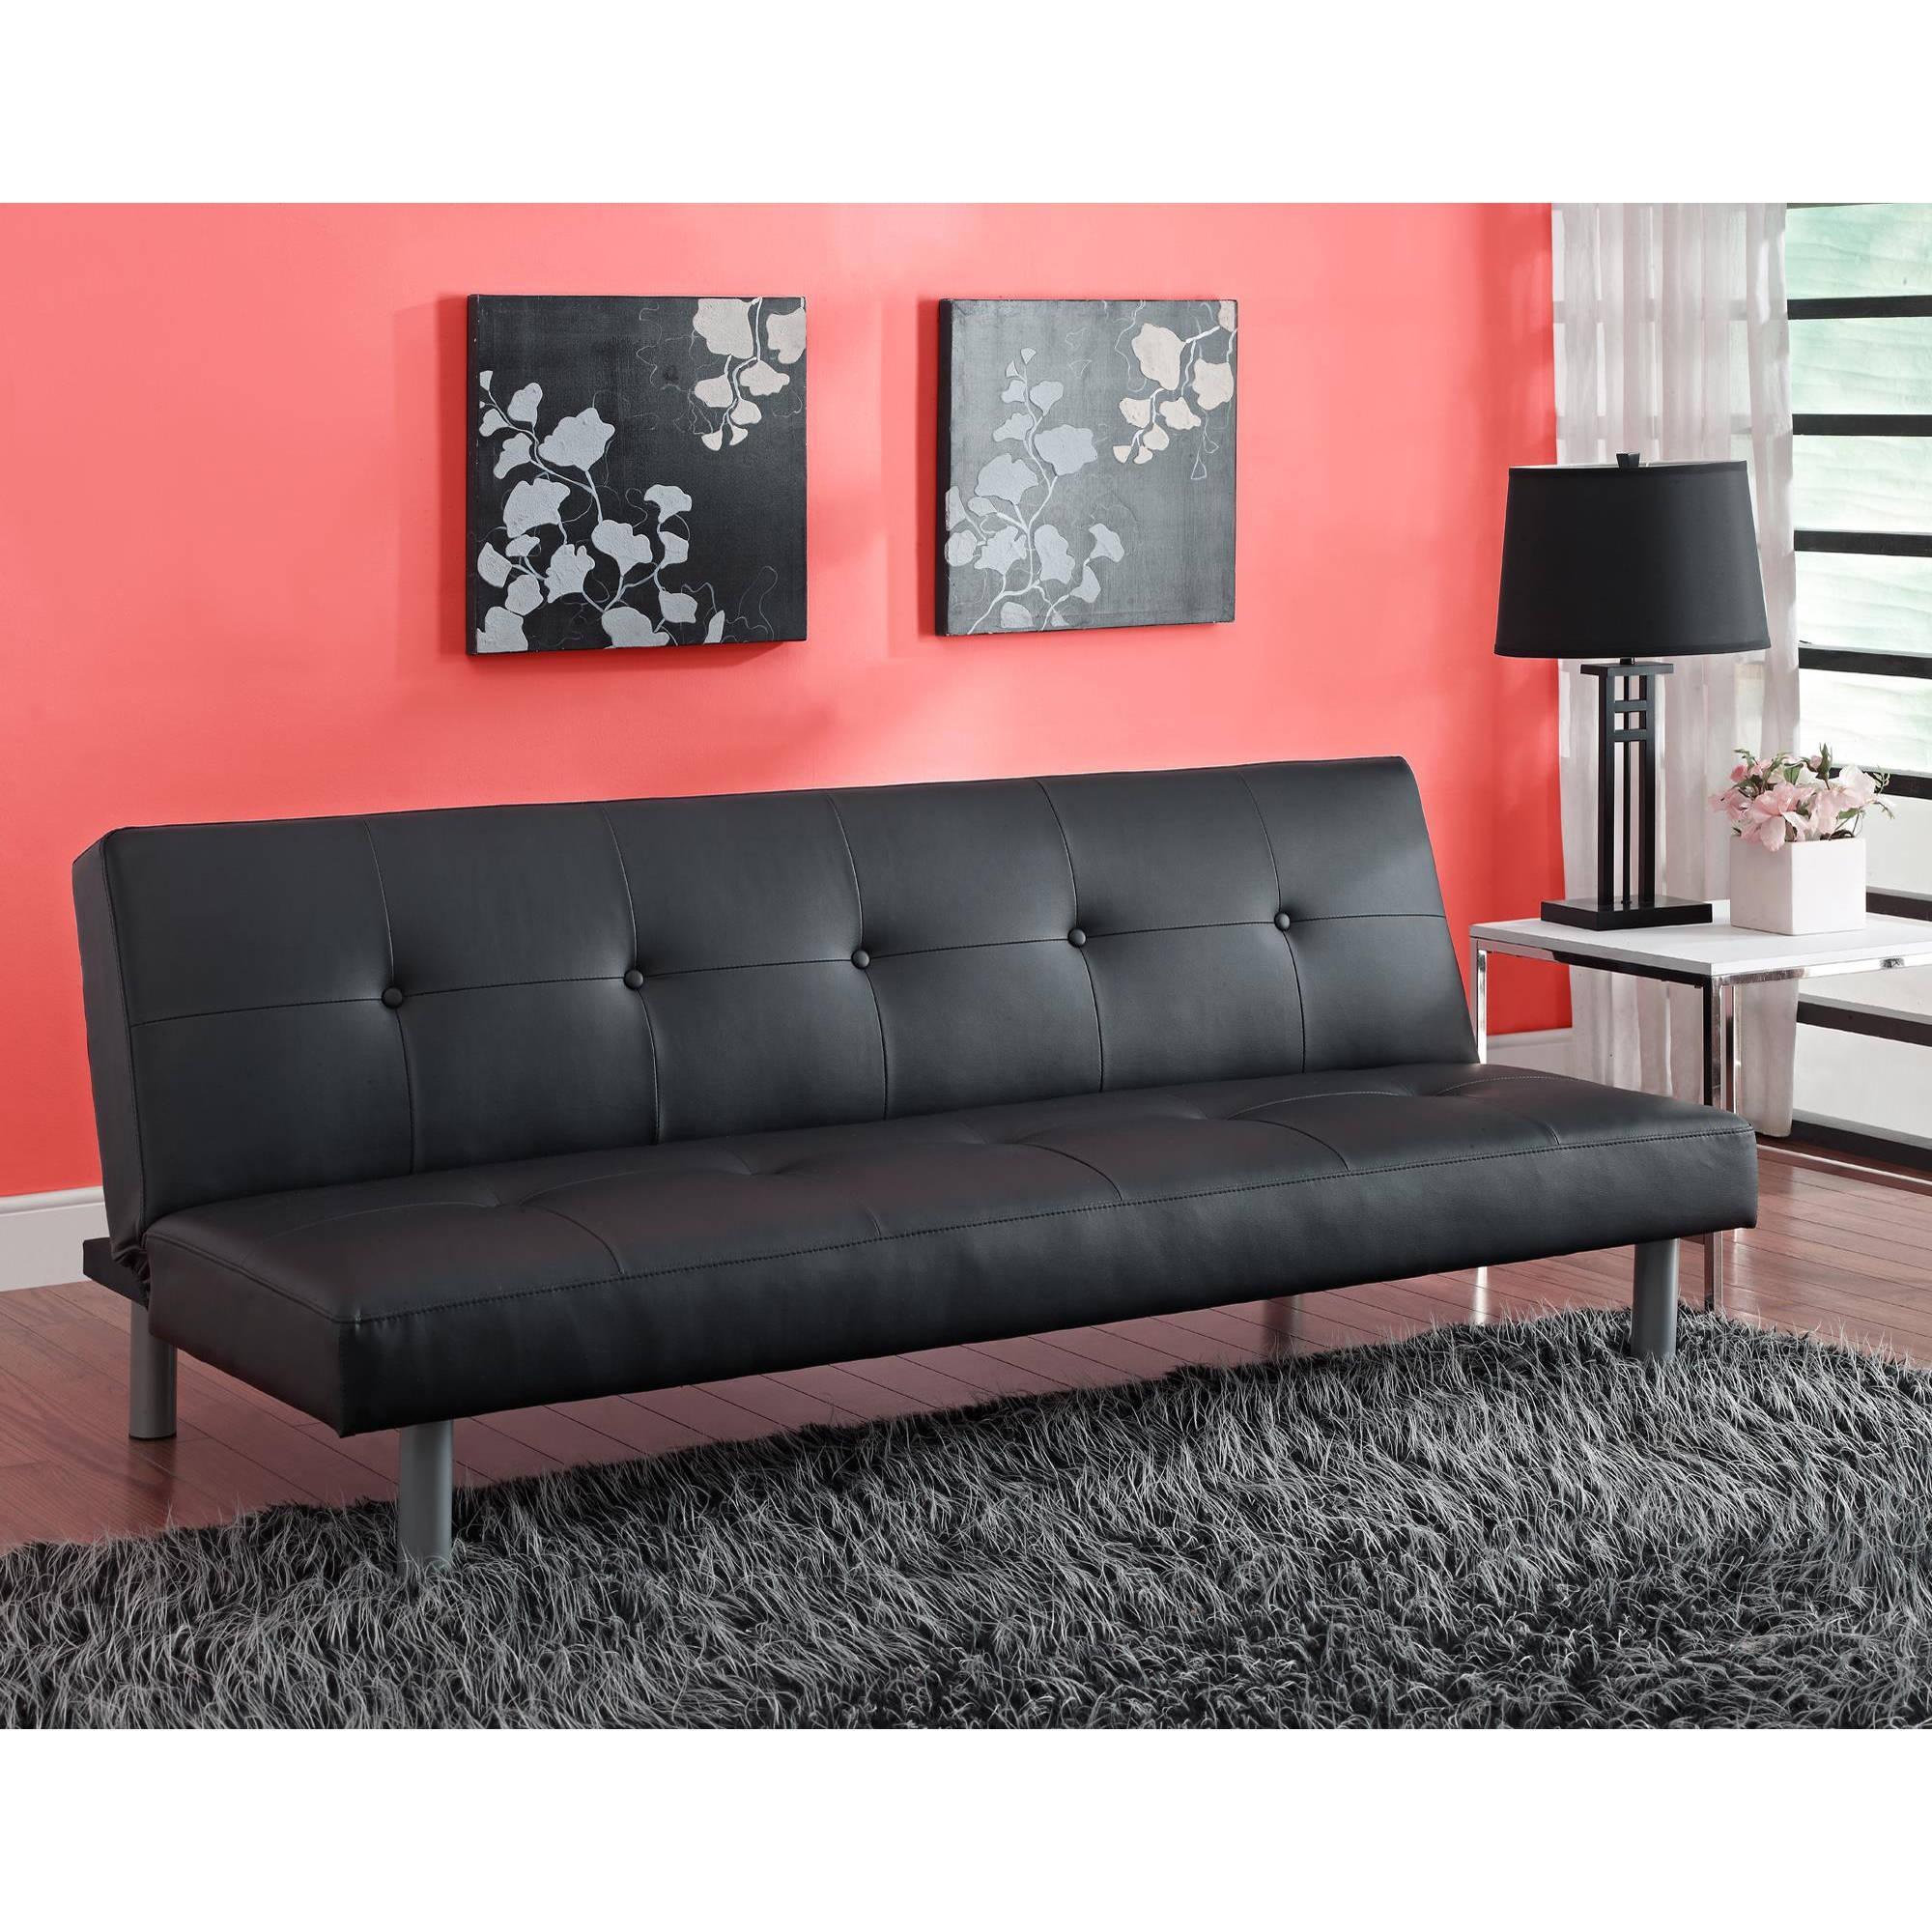 Furniture: Target Futons | Futon Beds Walmart | Couch Bed Walmart In Futon Couch Beds (View 16 of 20)